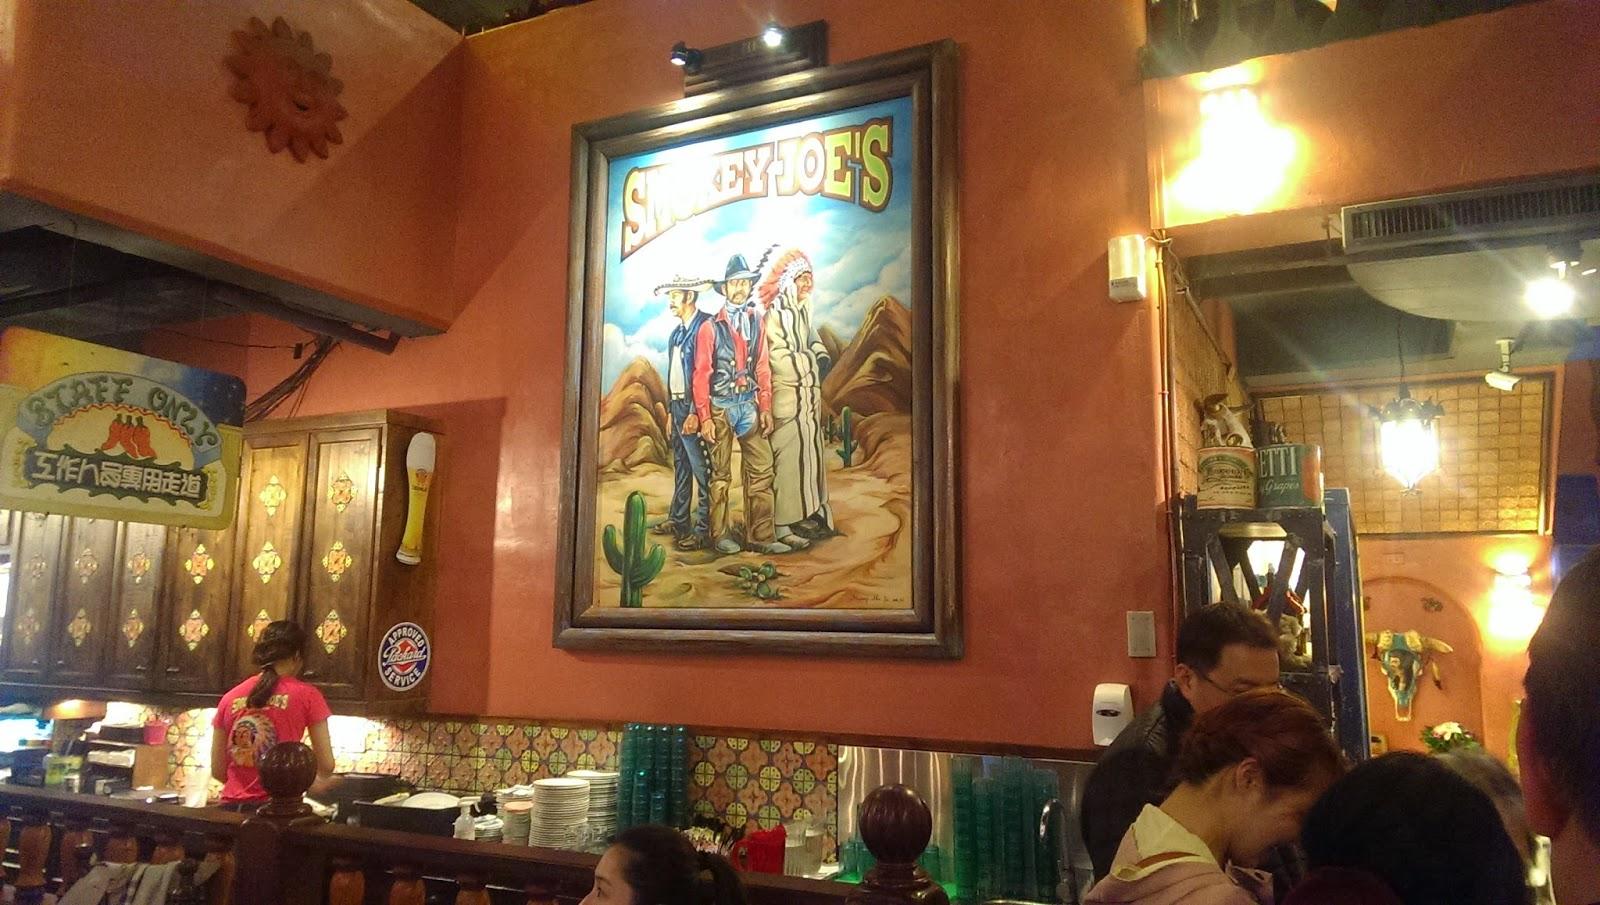 2015 01 24%2B20.08.43 - [食記] Smokey Joe's 冒煙的喬 高雄左營的美式墨西哥餐廳!